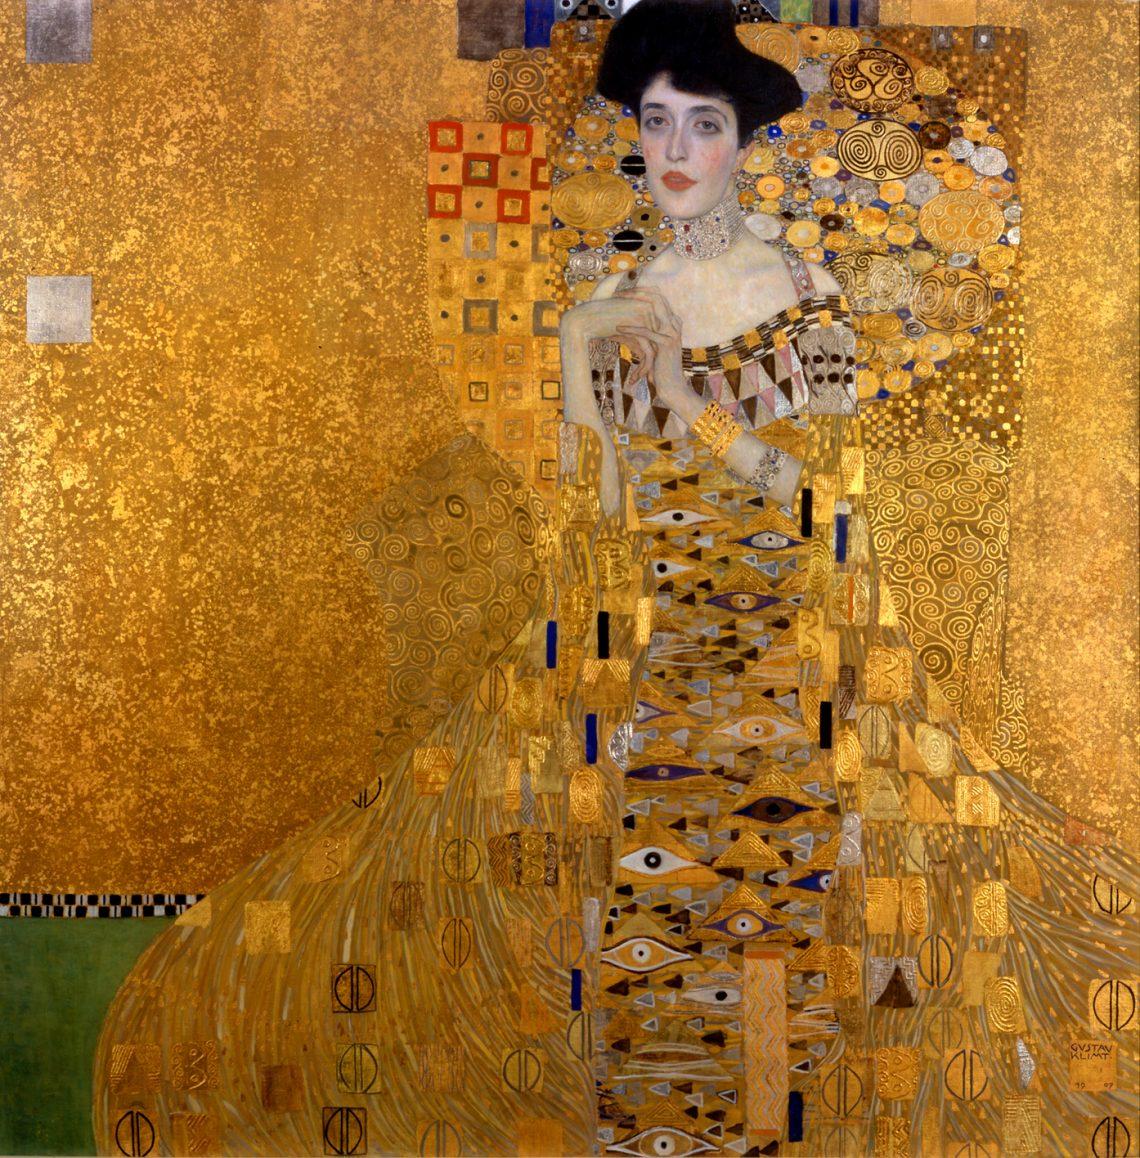 Klimt portrait of Adele Bloch-Bauer I